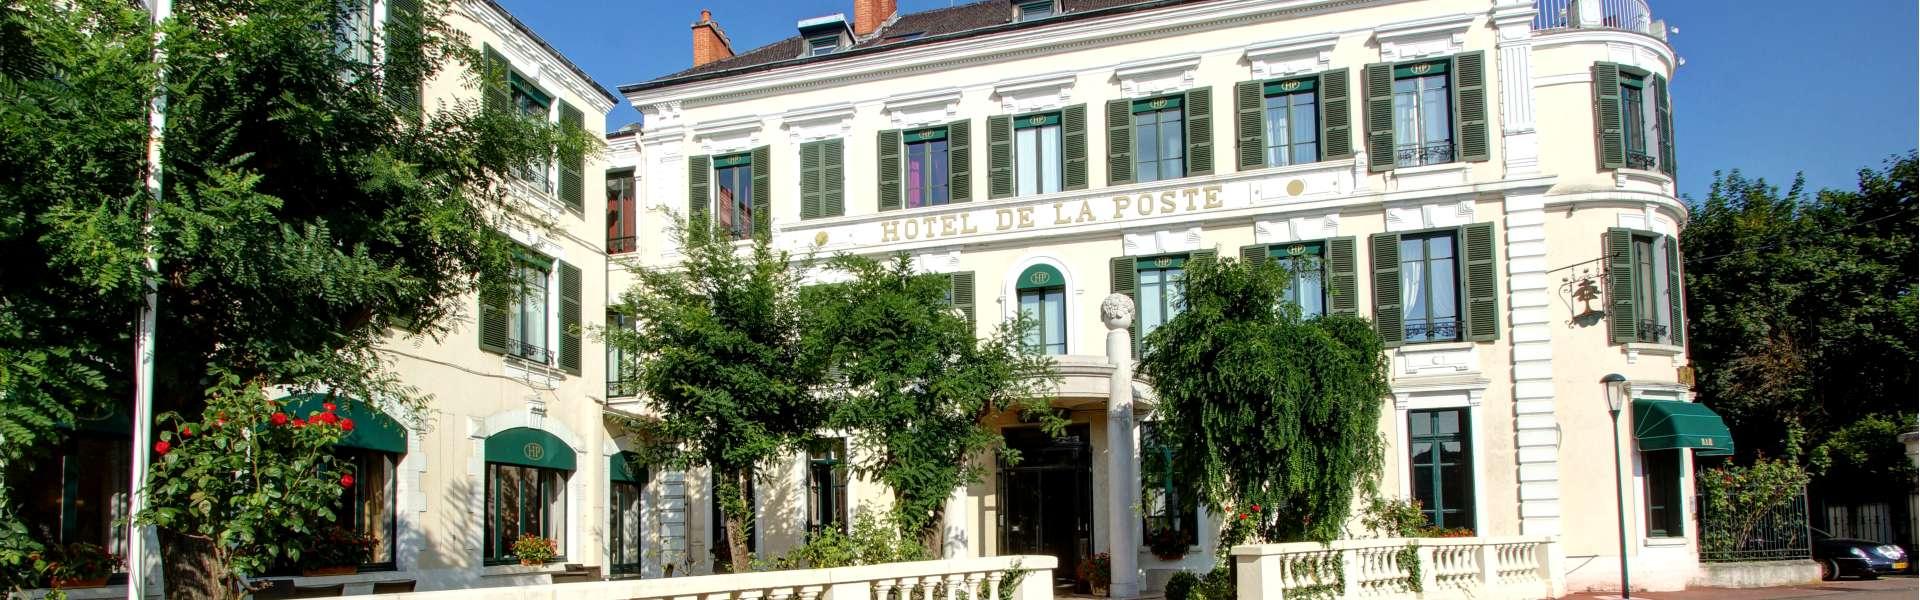 Restaurant Hotel De La Poste